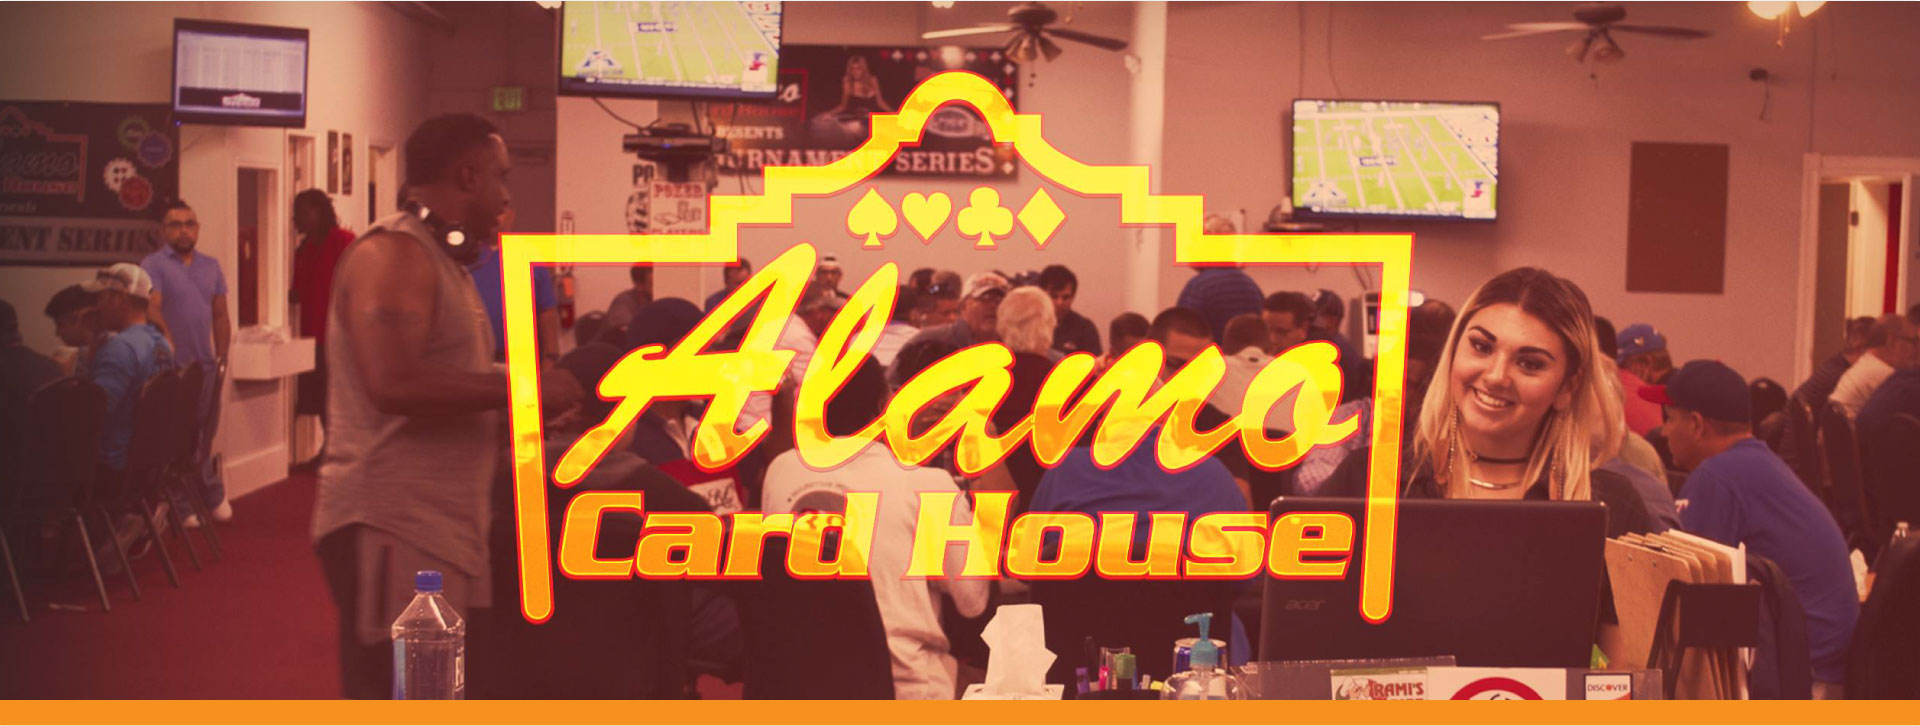 Alamo Card House